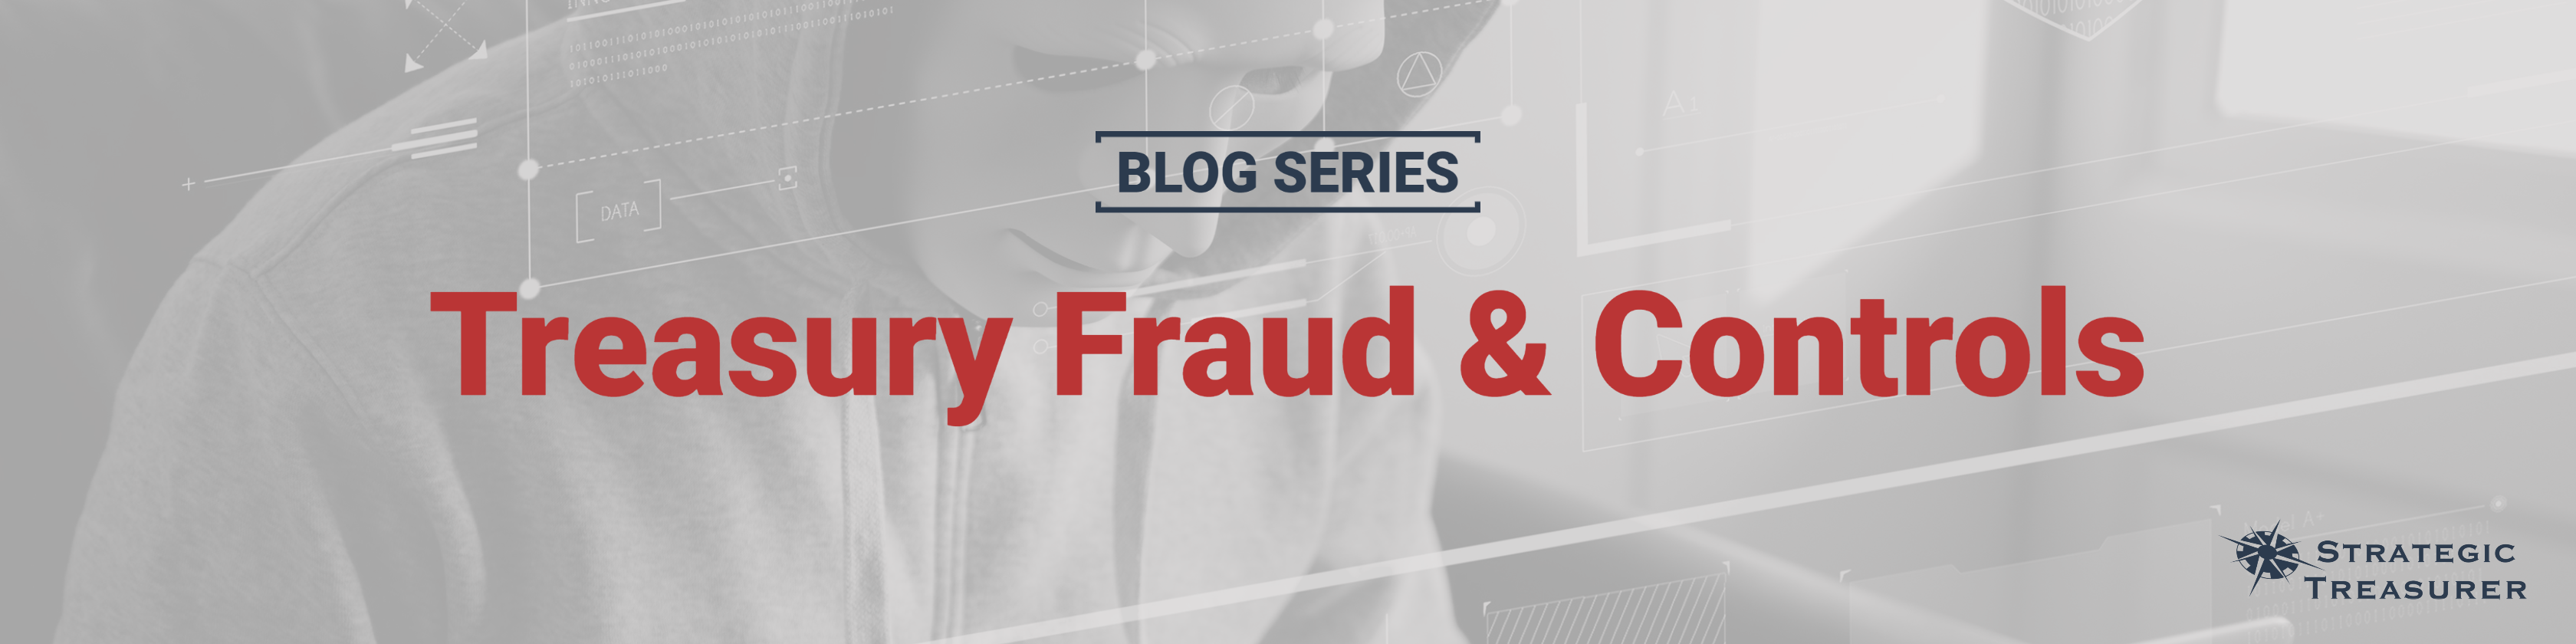 Treasury Fraud & Controls Blog Series